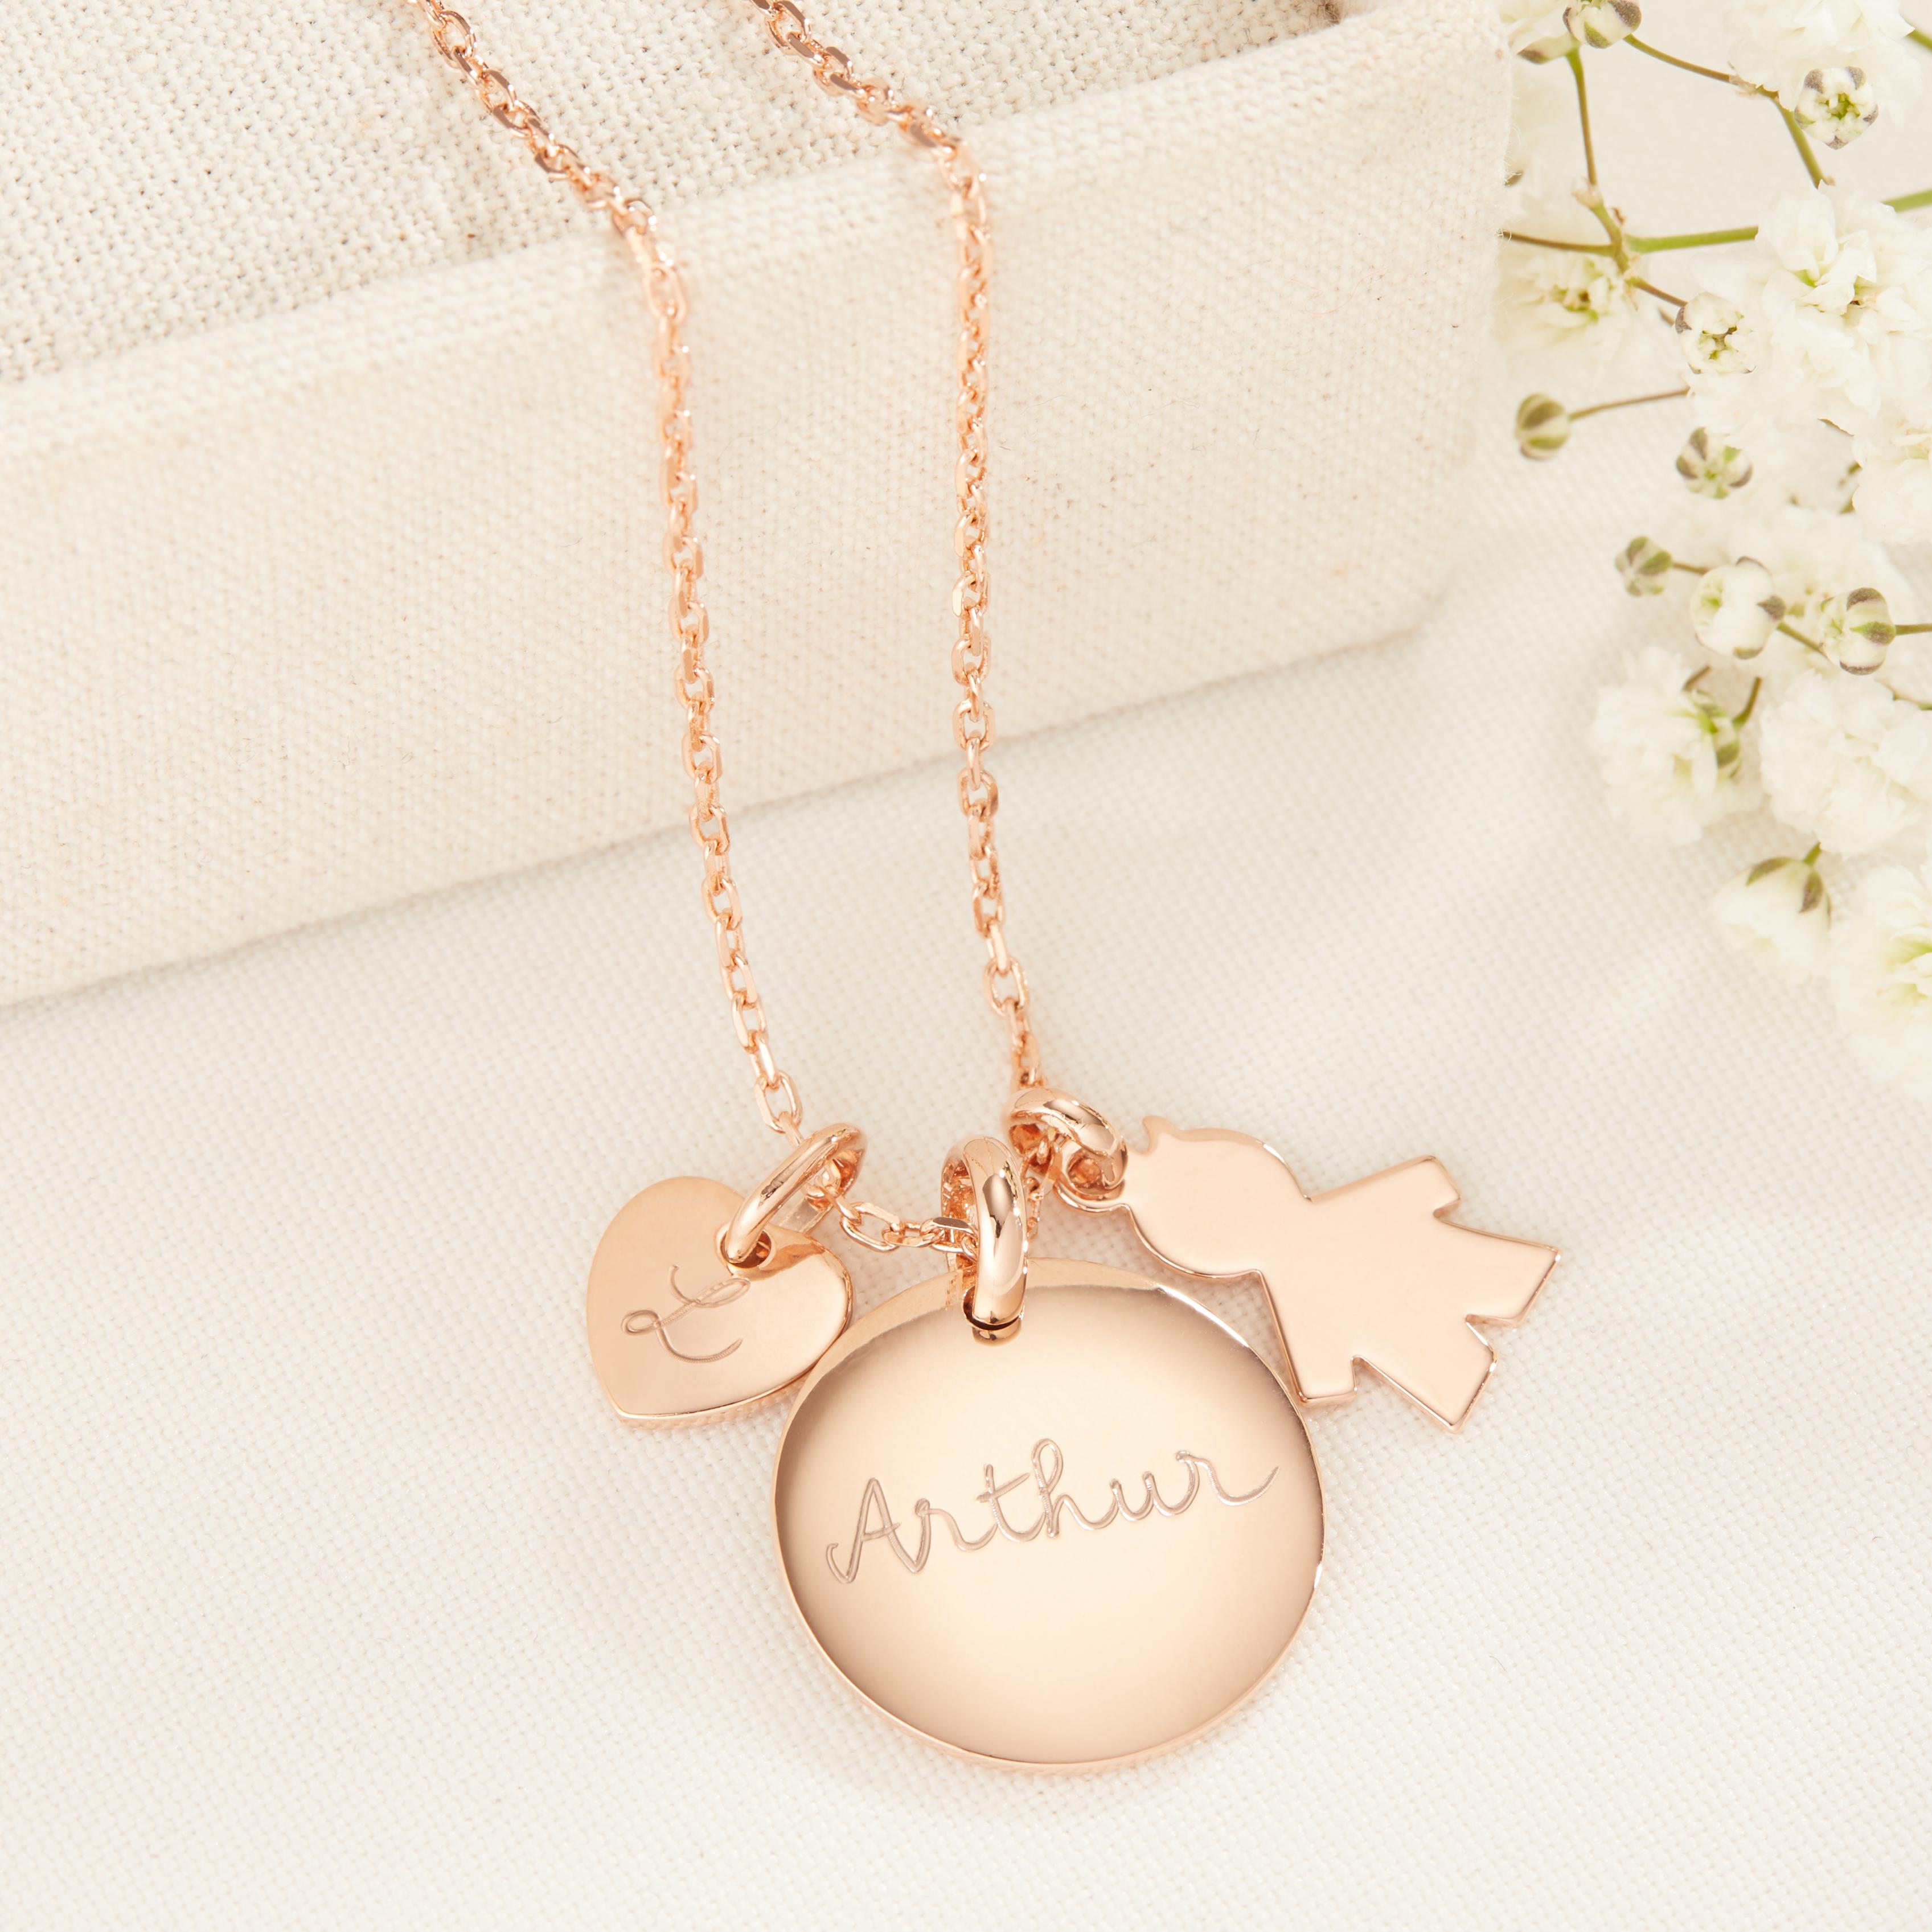 merci-maman-duchess-necklace-rose-25-april